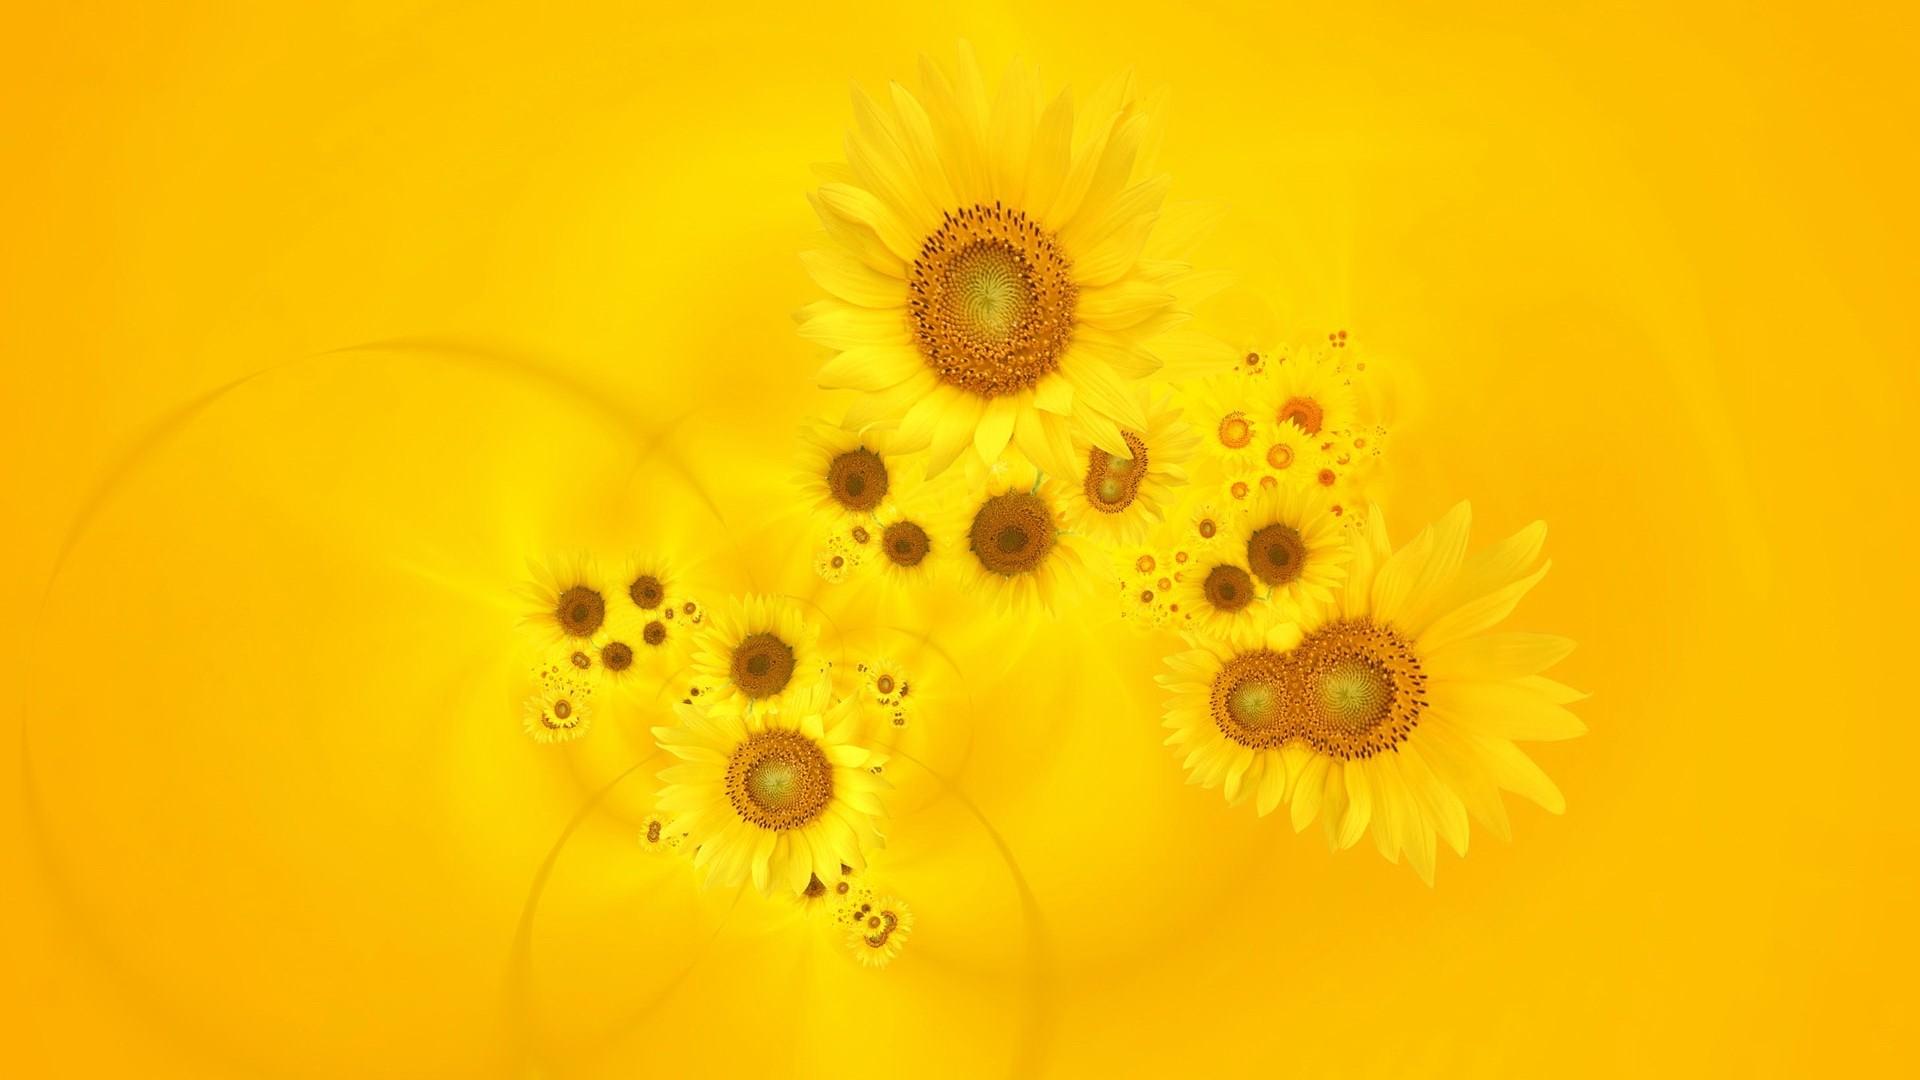 Cute Yellow a wallpaper